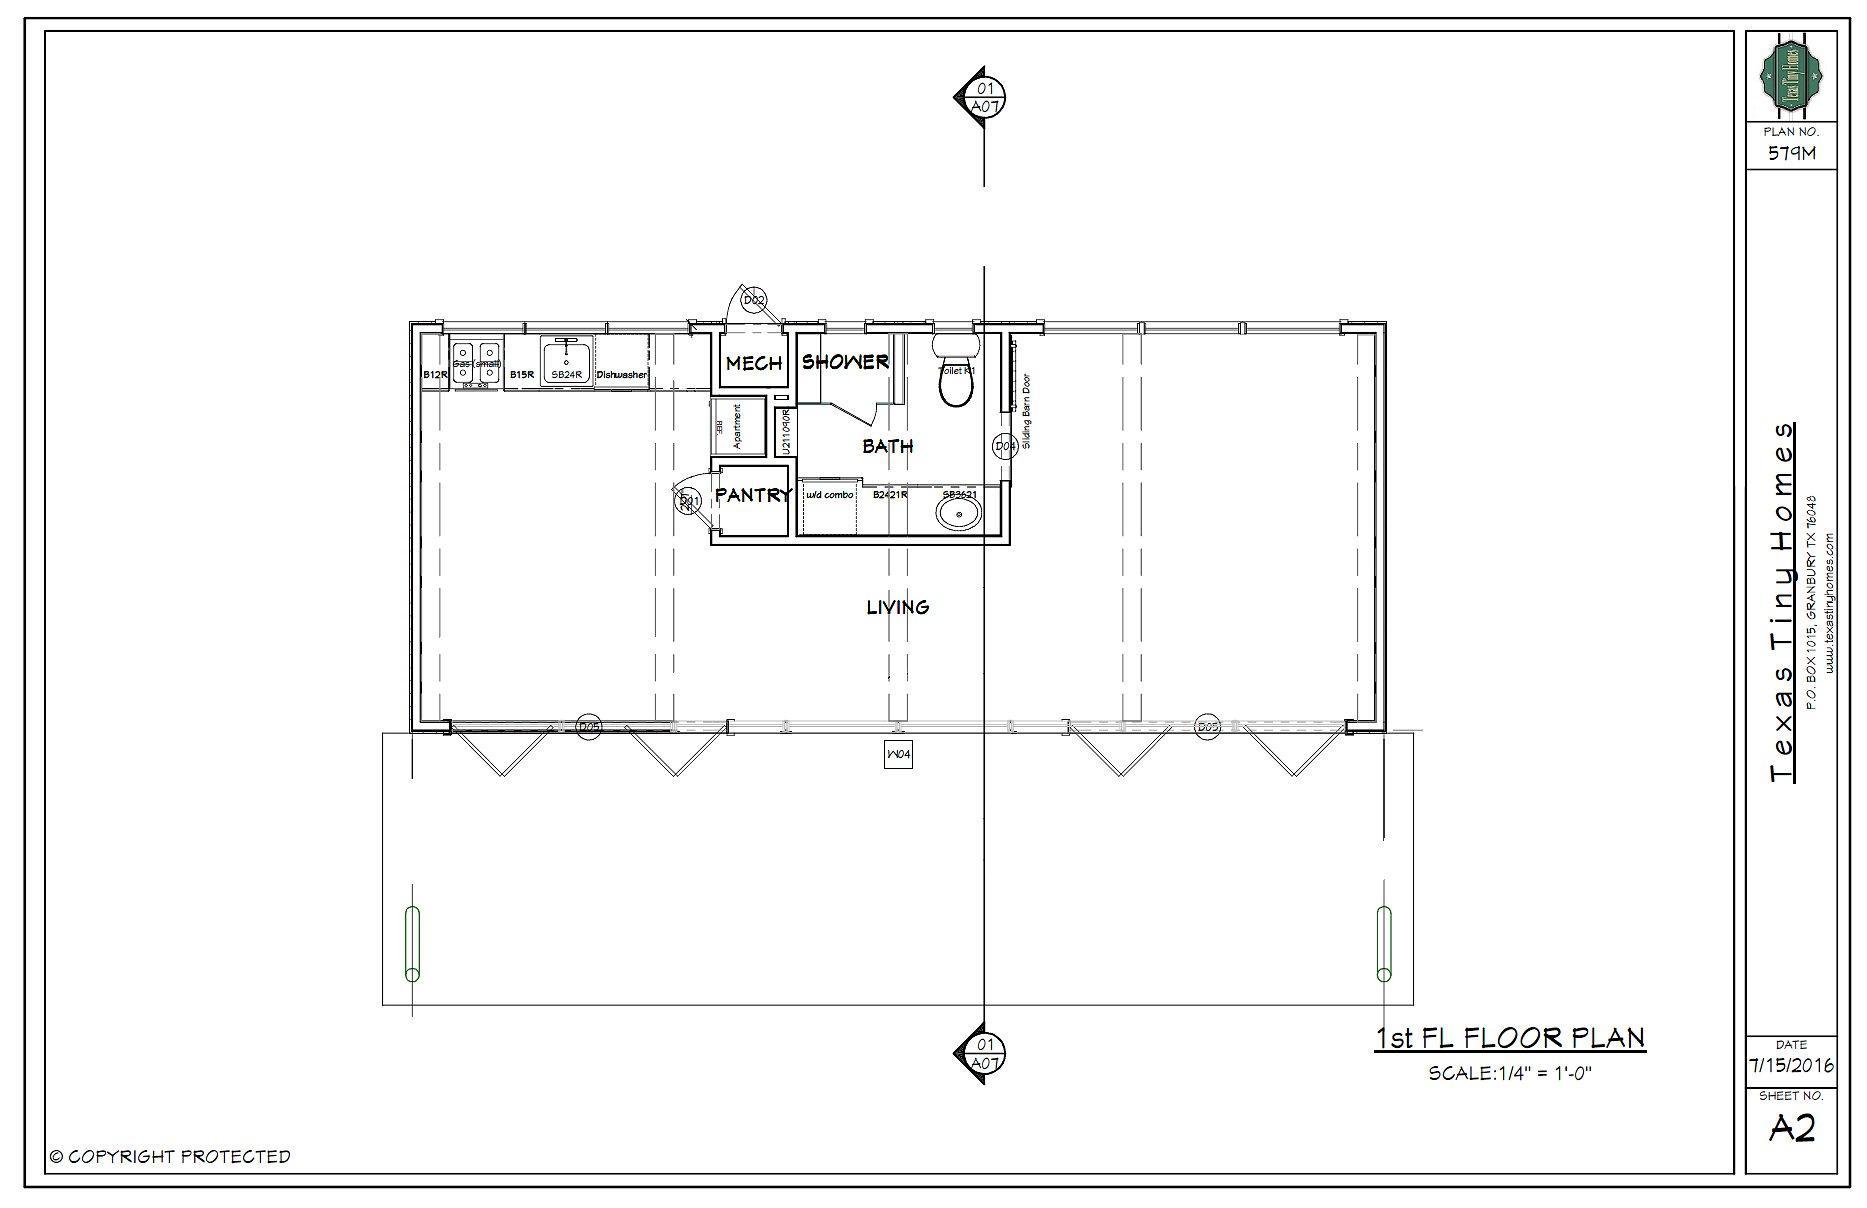 Floor Plan Presentation